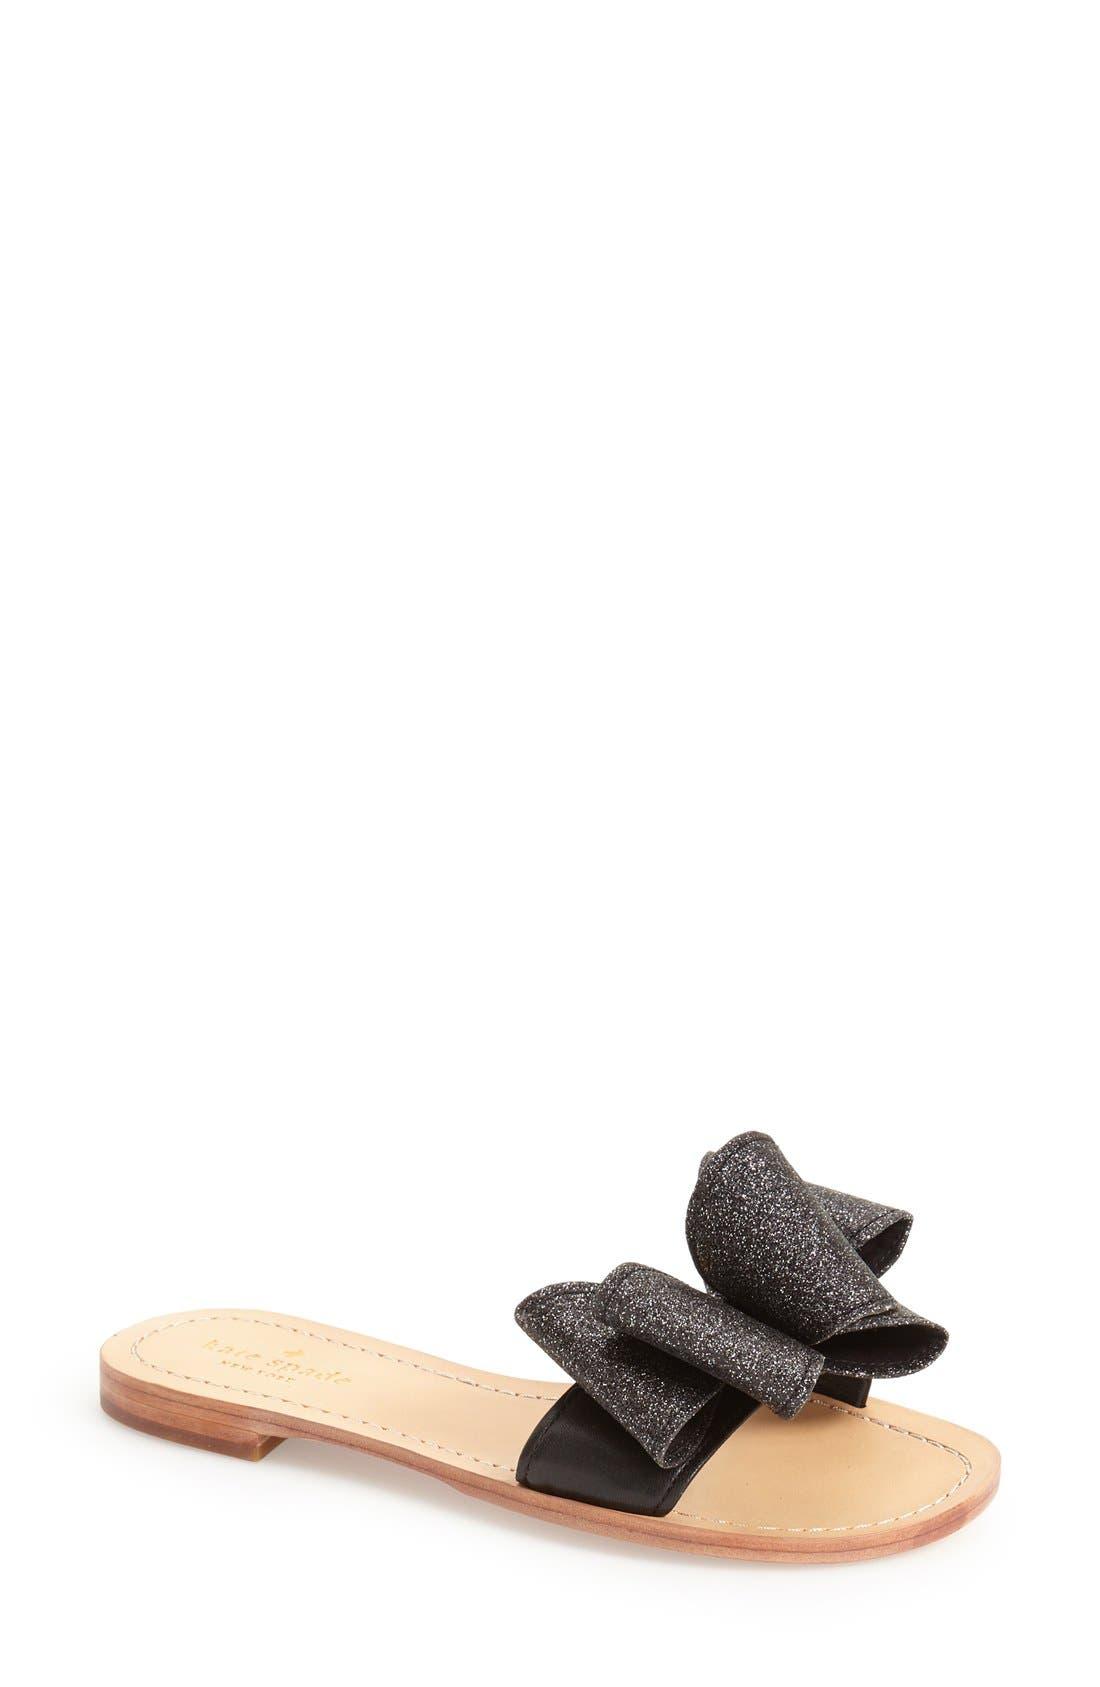 KATE SPADE NEW YORK, 'cicely' sandal, Main thumbnail 1, color, 006